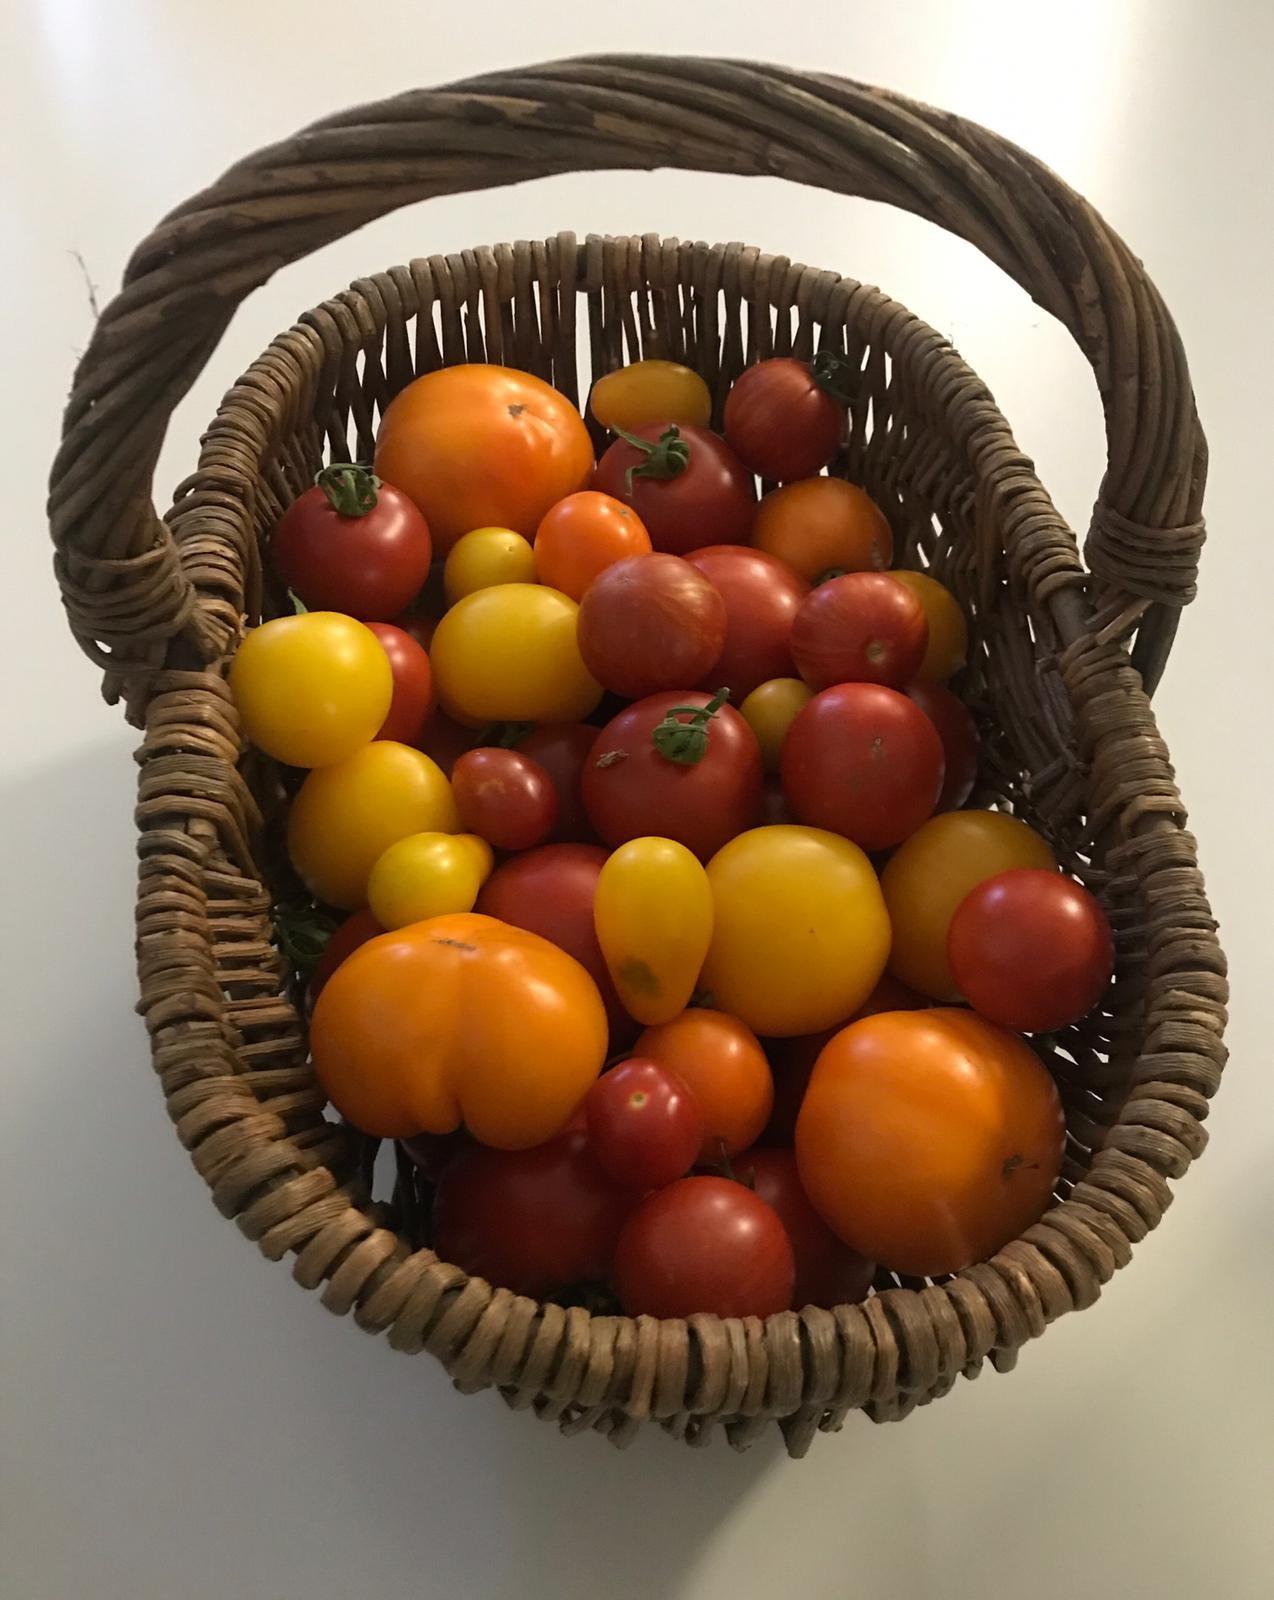 Tomatenkorb.jpg